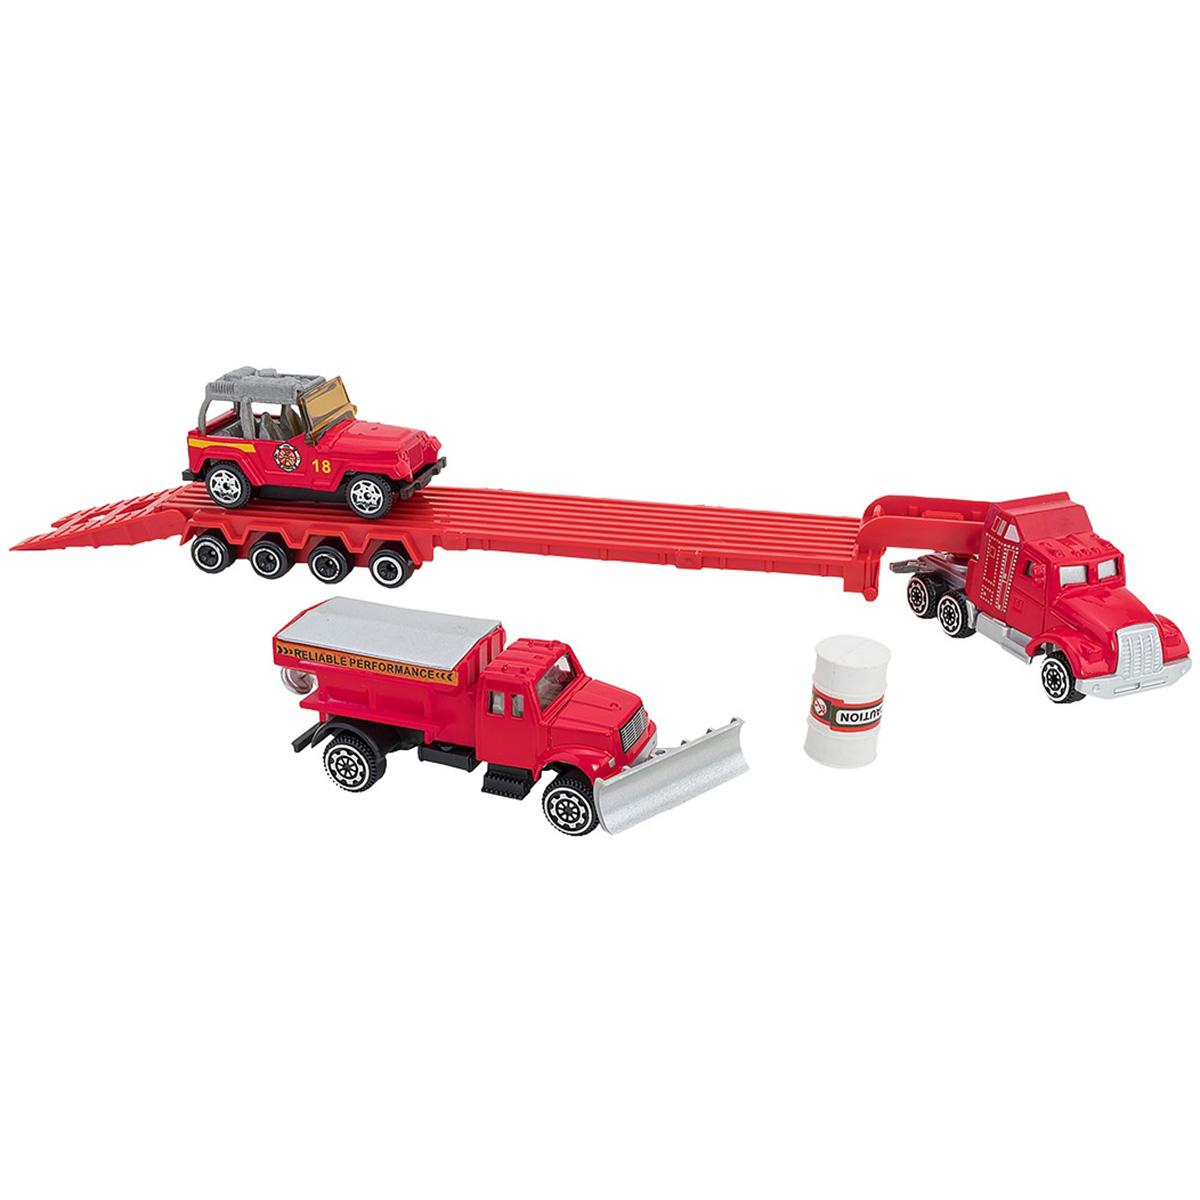 Set Camion transportator si masinute Globo Die Cast Metal, Rosu